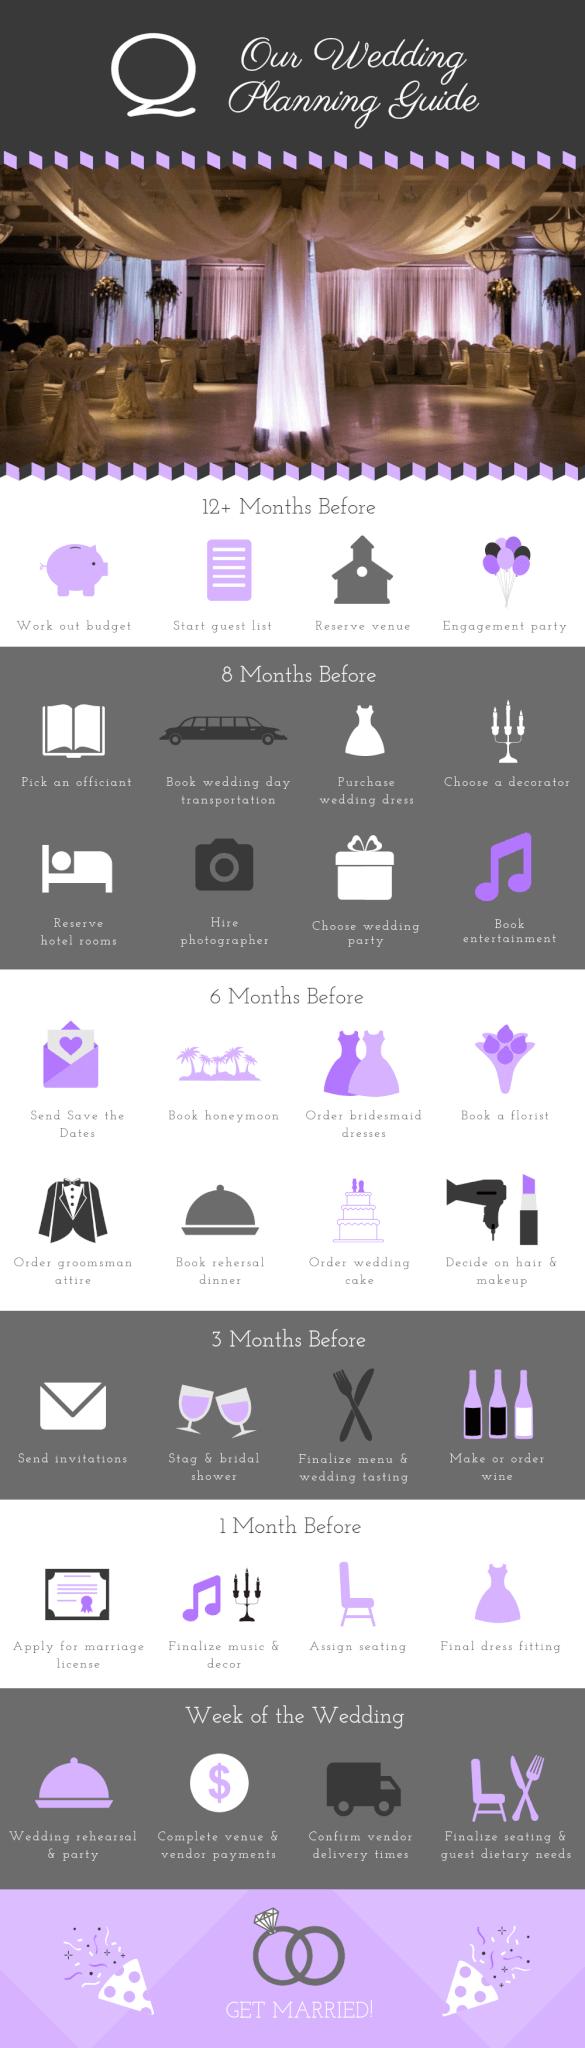 Wedding Planner Infographic